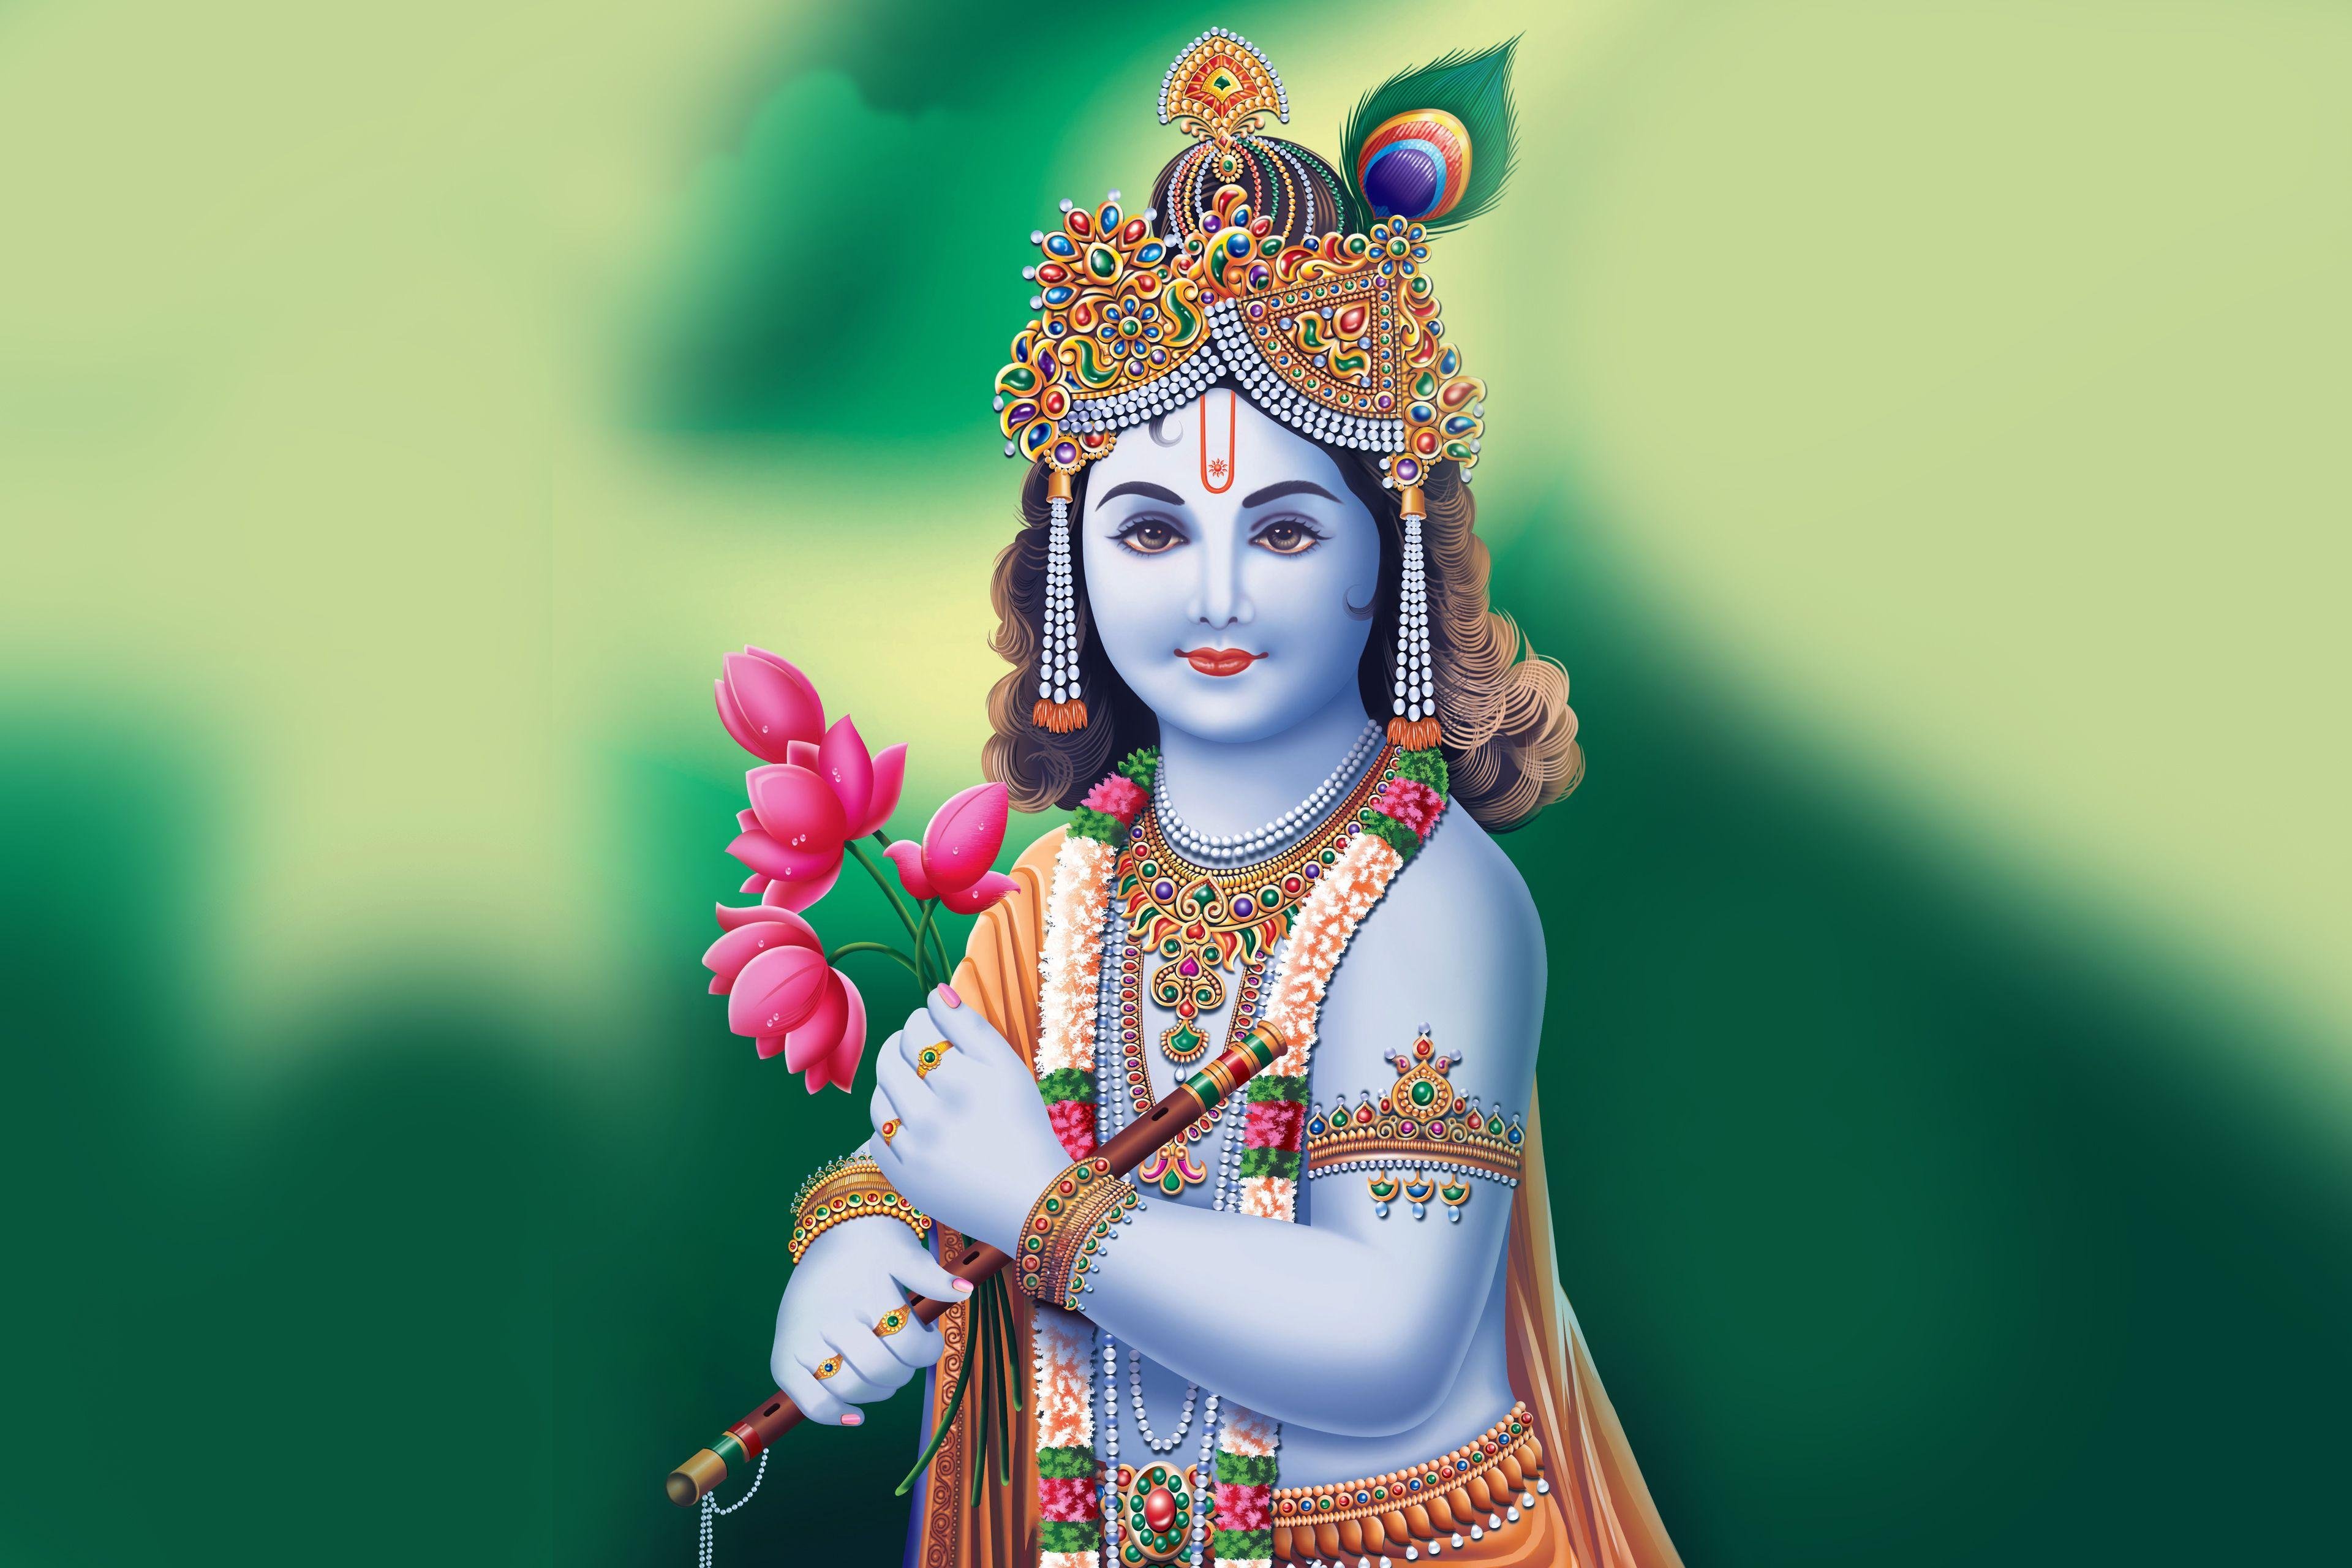 Shree Krishna Wallpapers HD - Wallpaper Cave